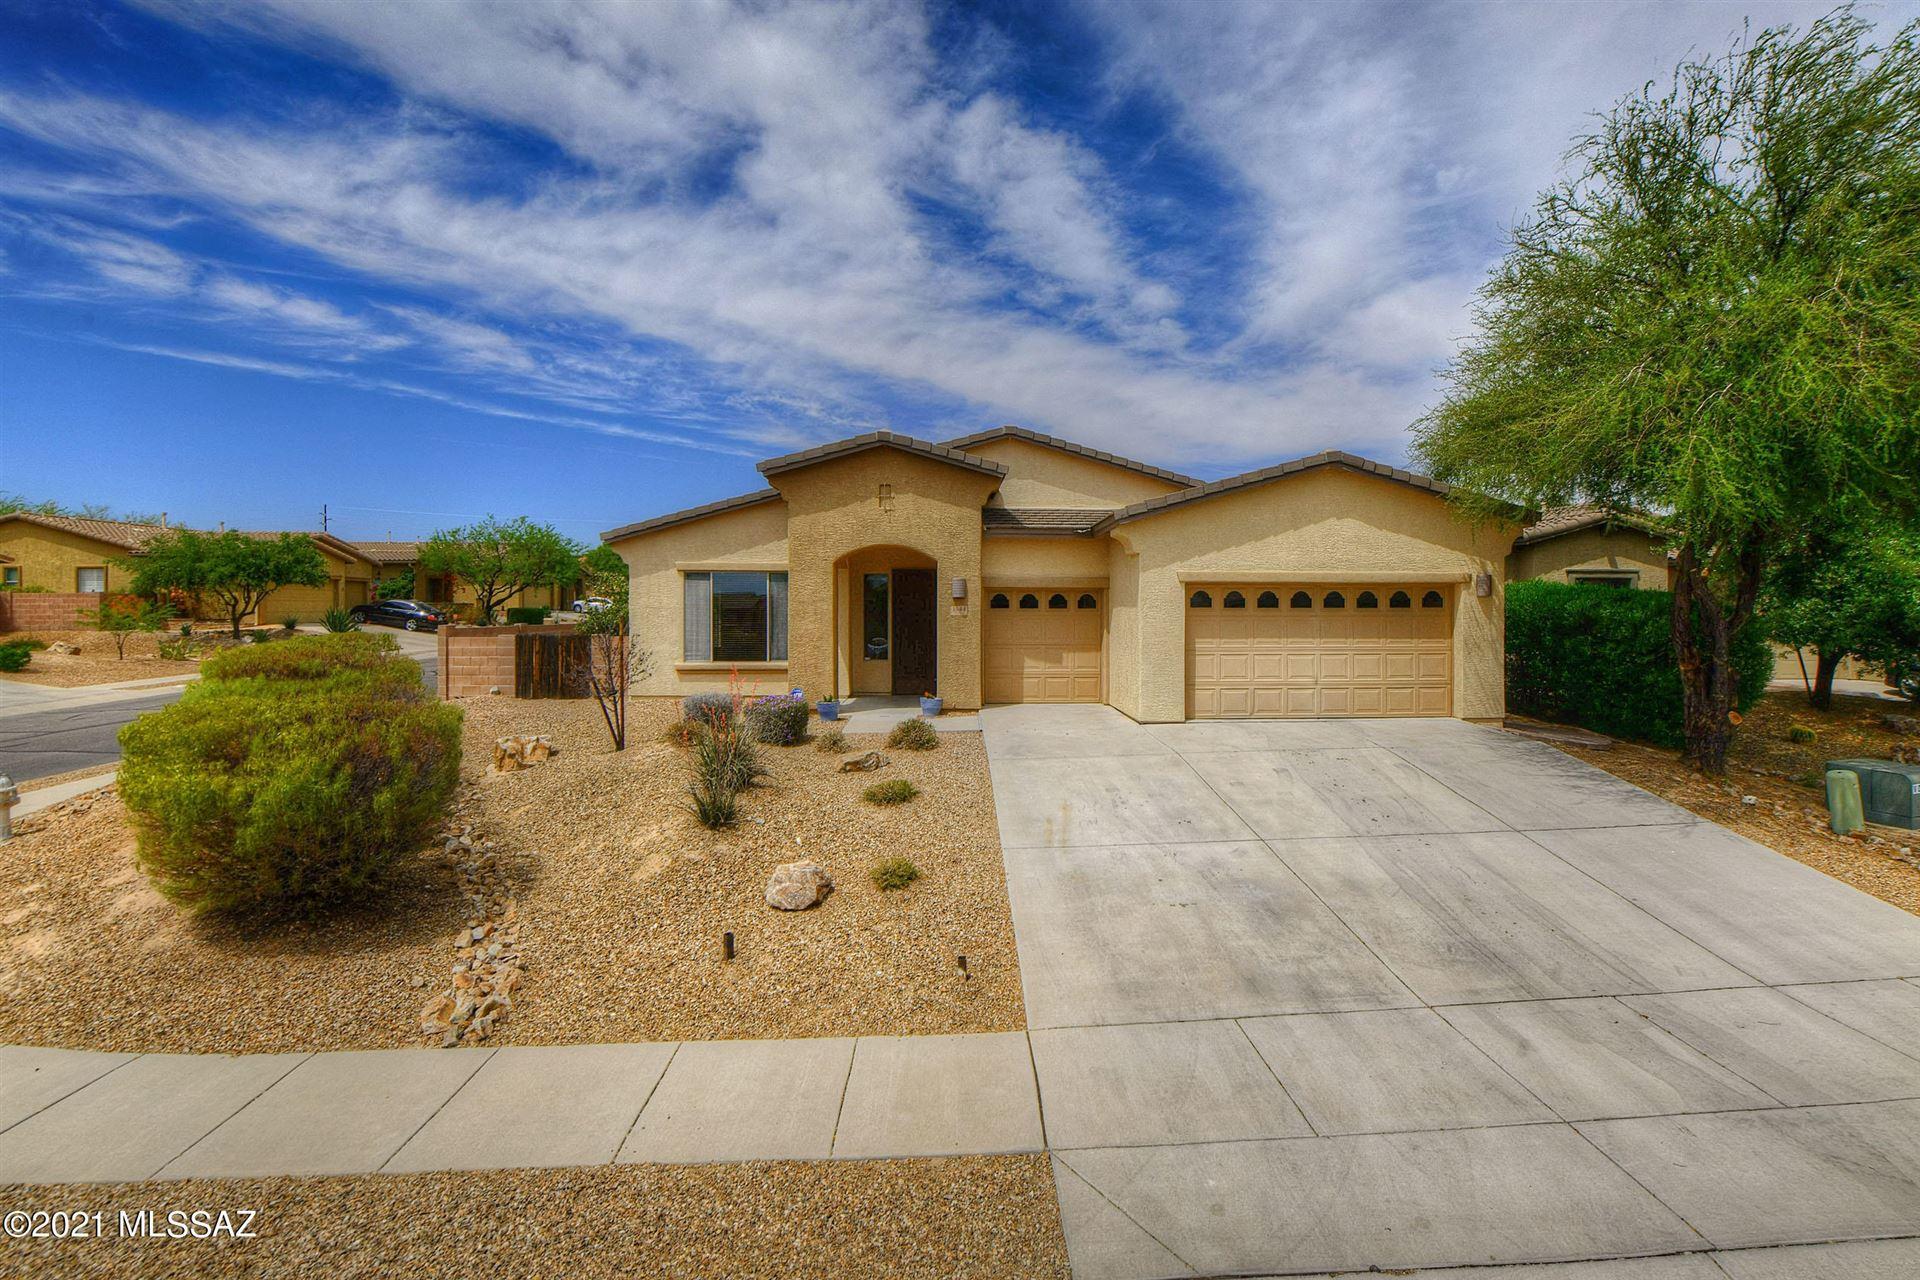 1544 W Soft Breeze Court, Oro Valley, AZ 85737 - MLS#: 22110448